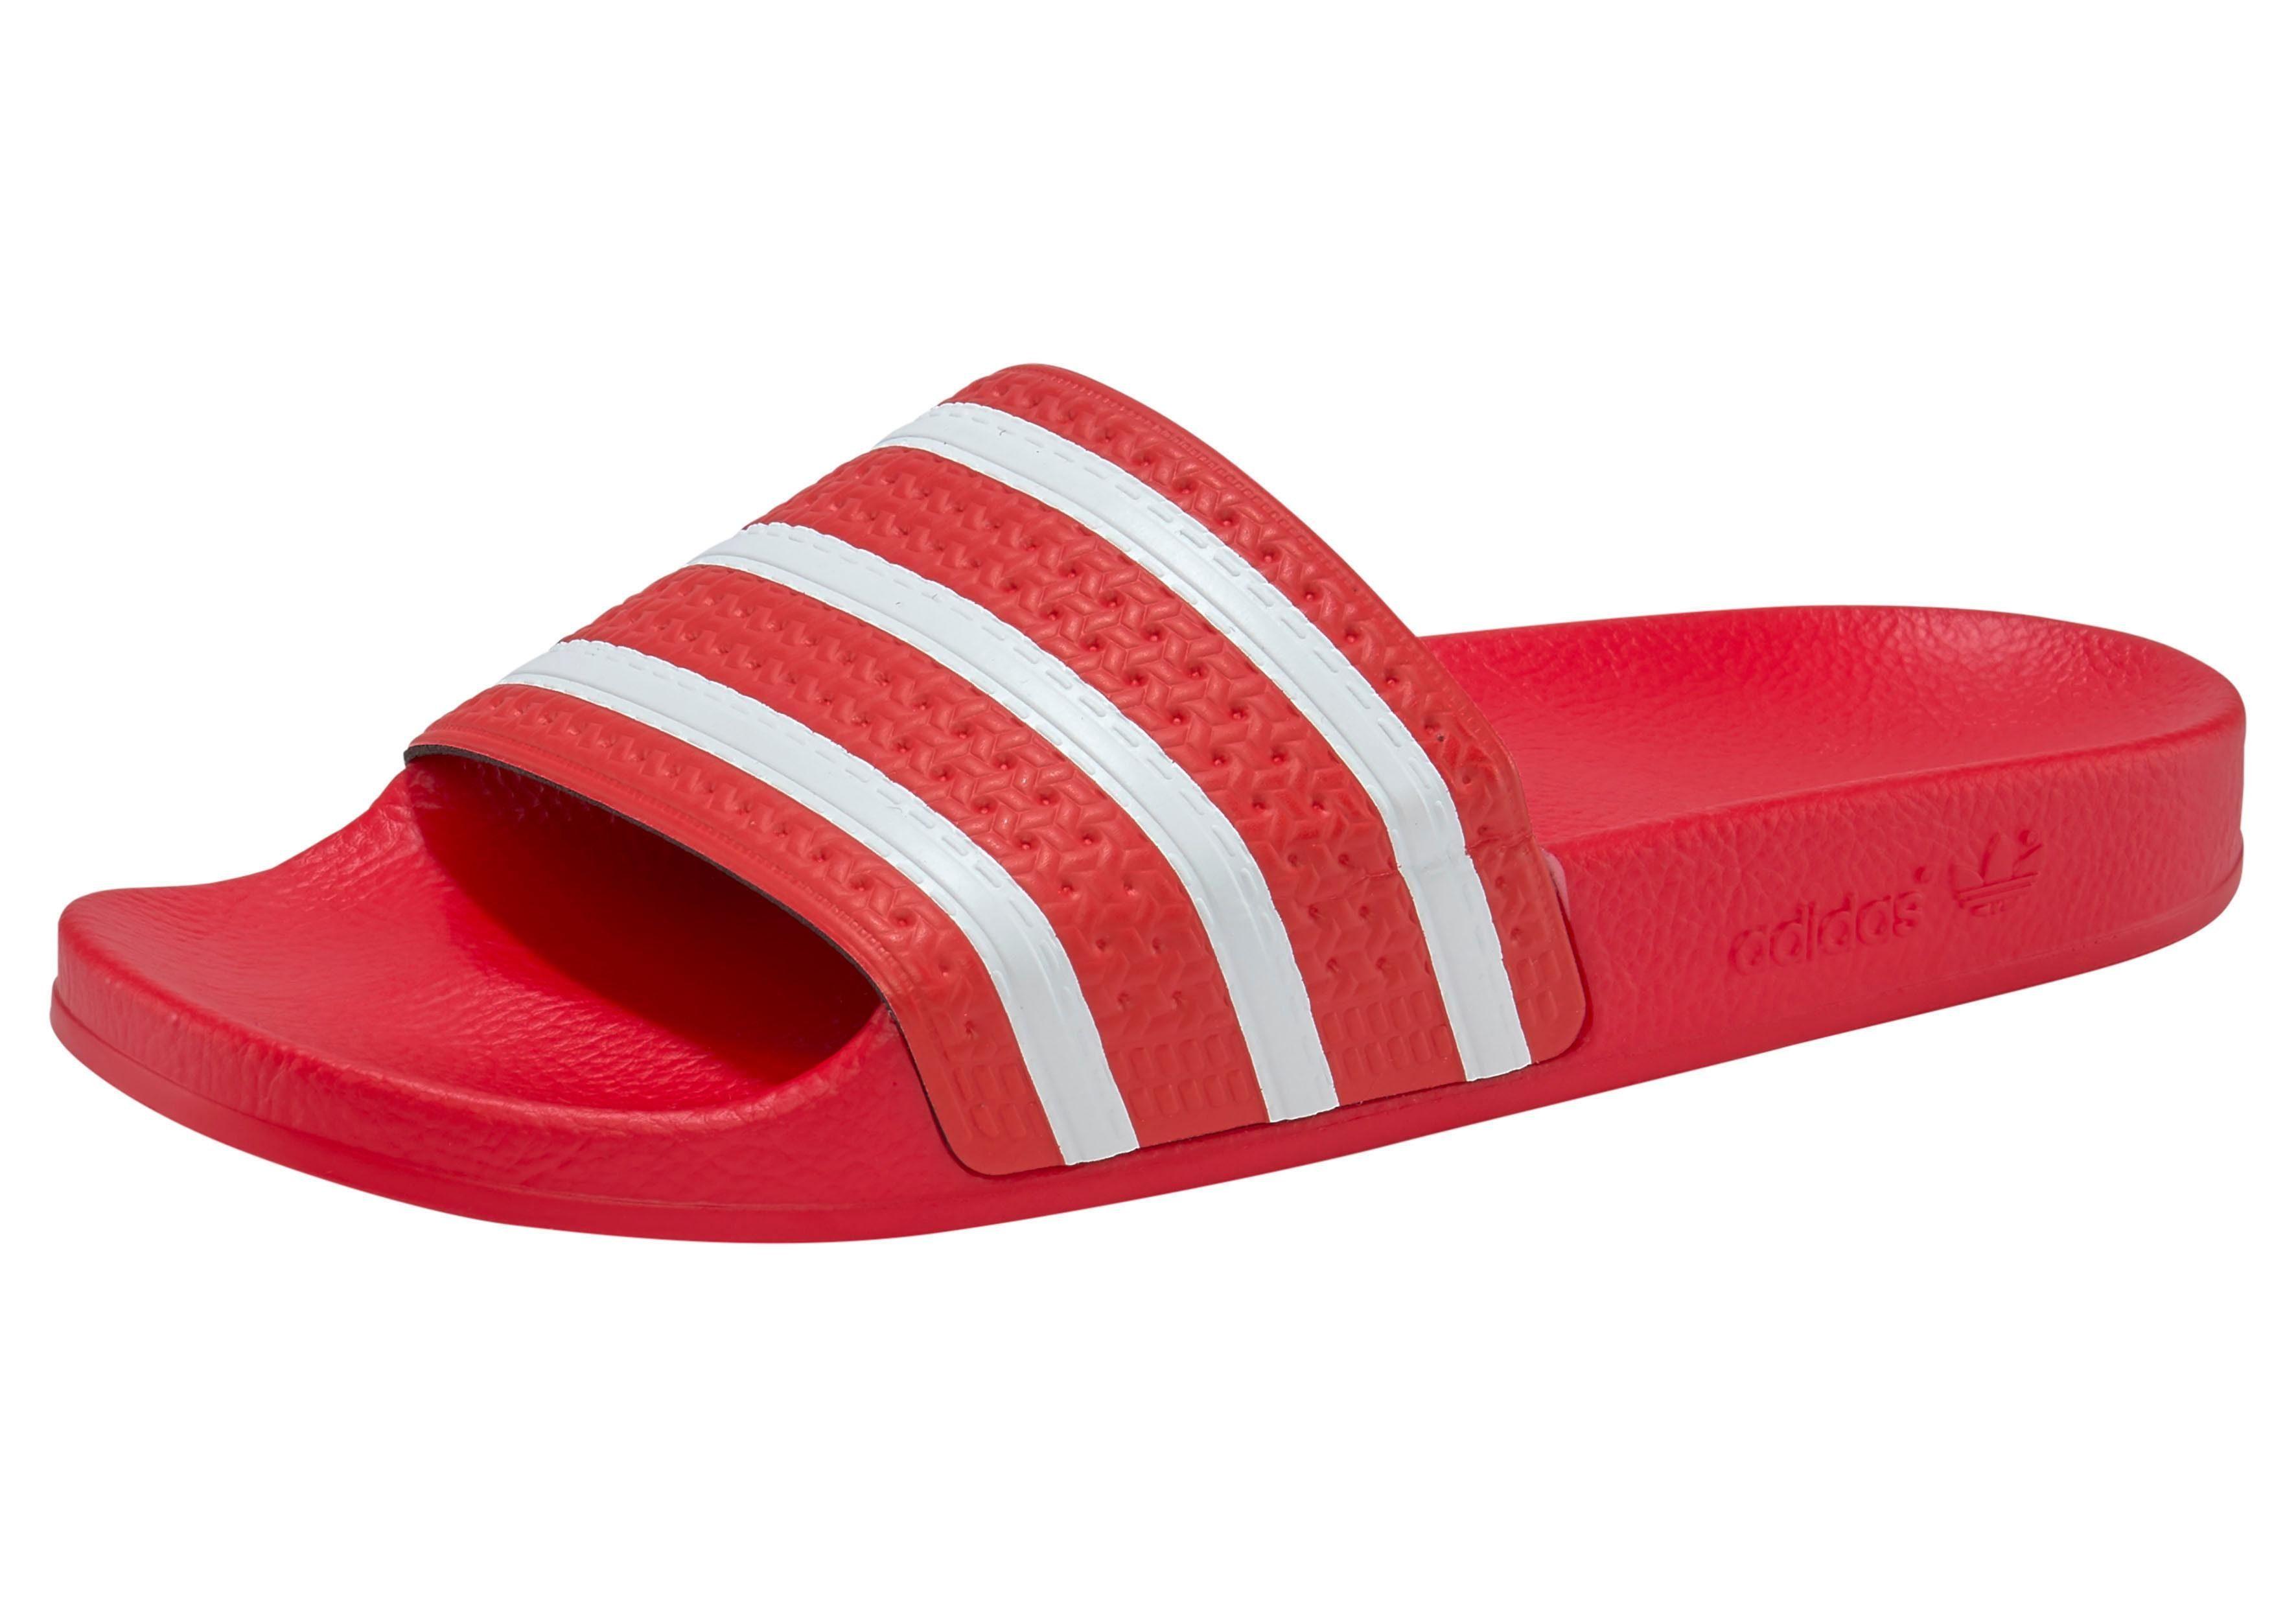 adidas Originals »Adilette« Badesandale kaufen | OTTO